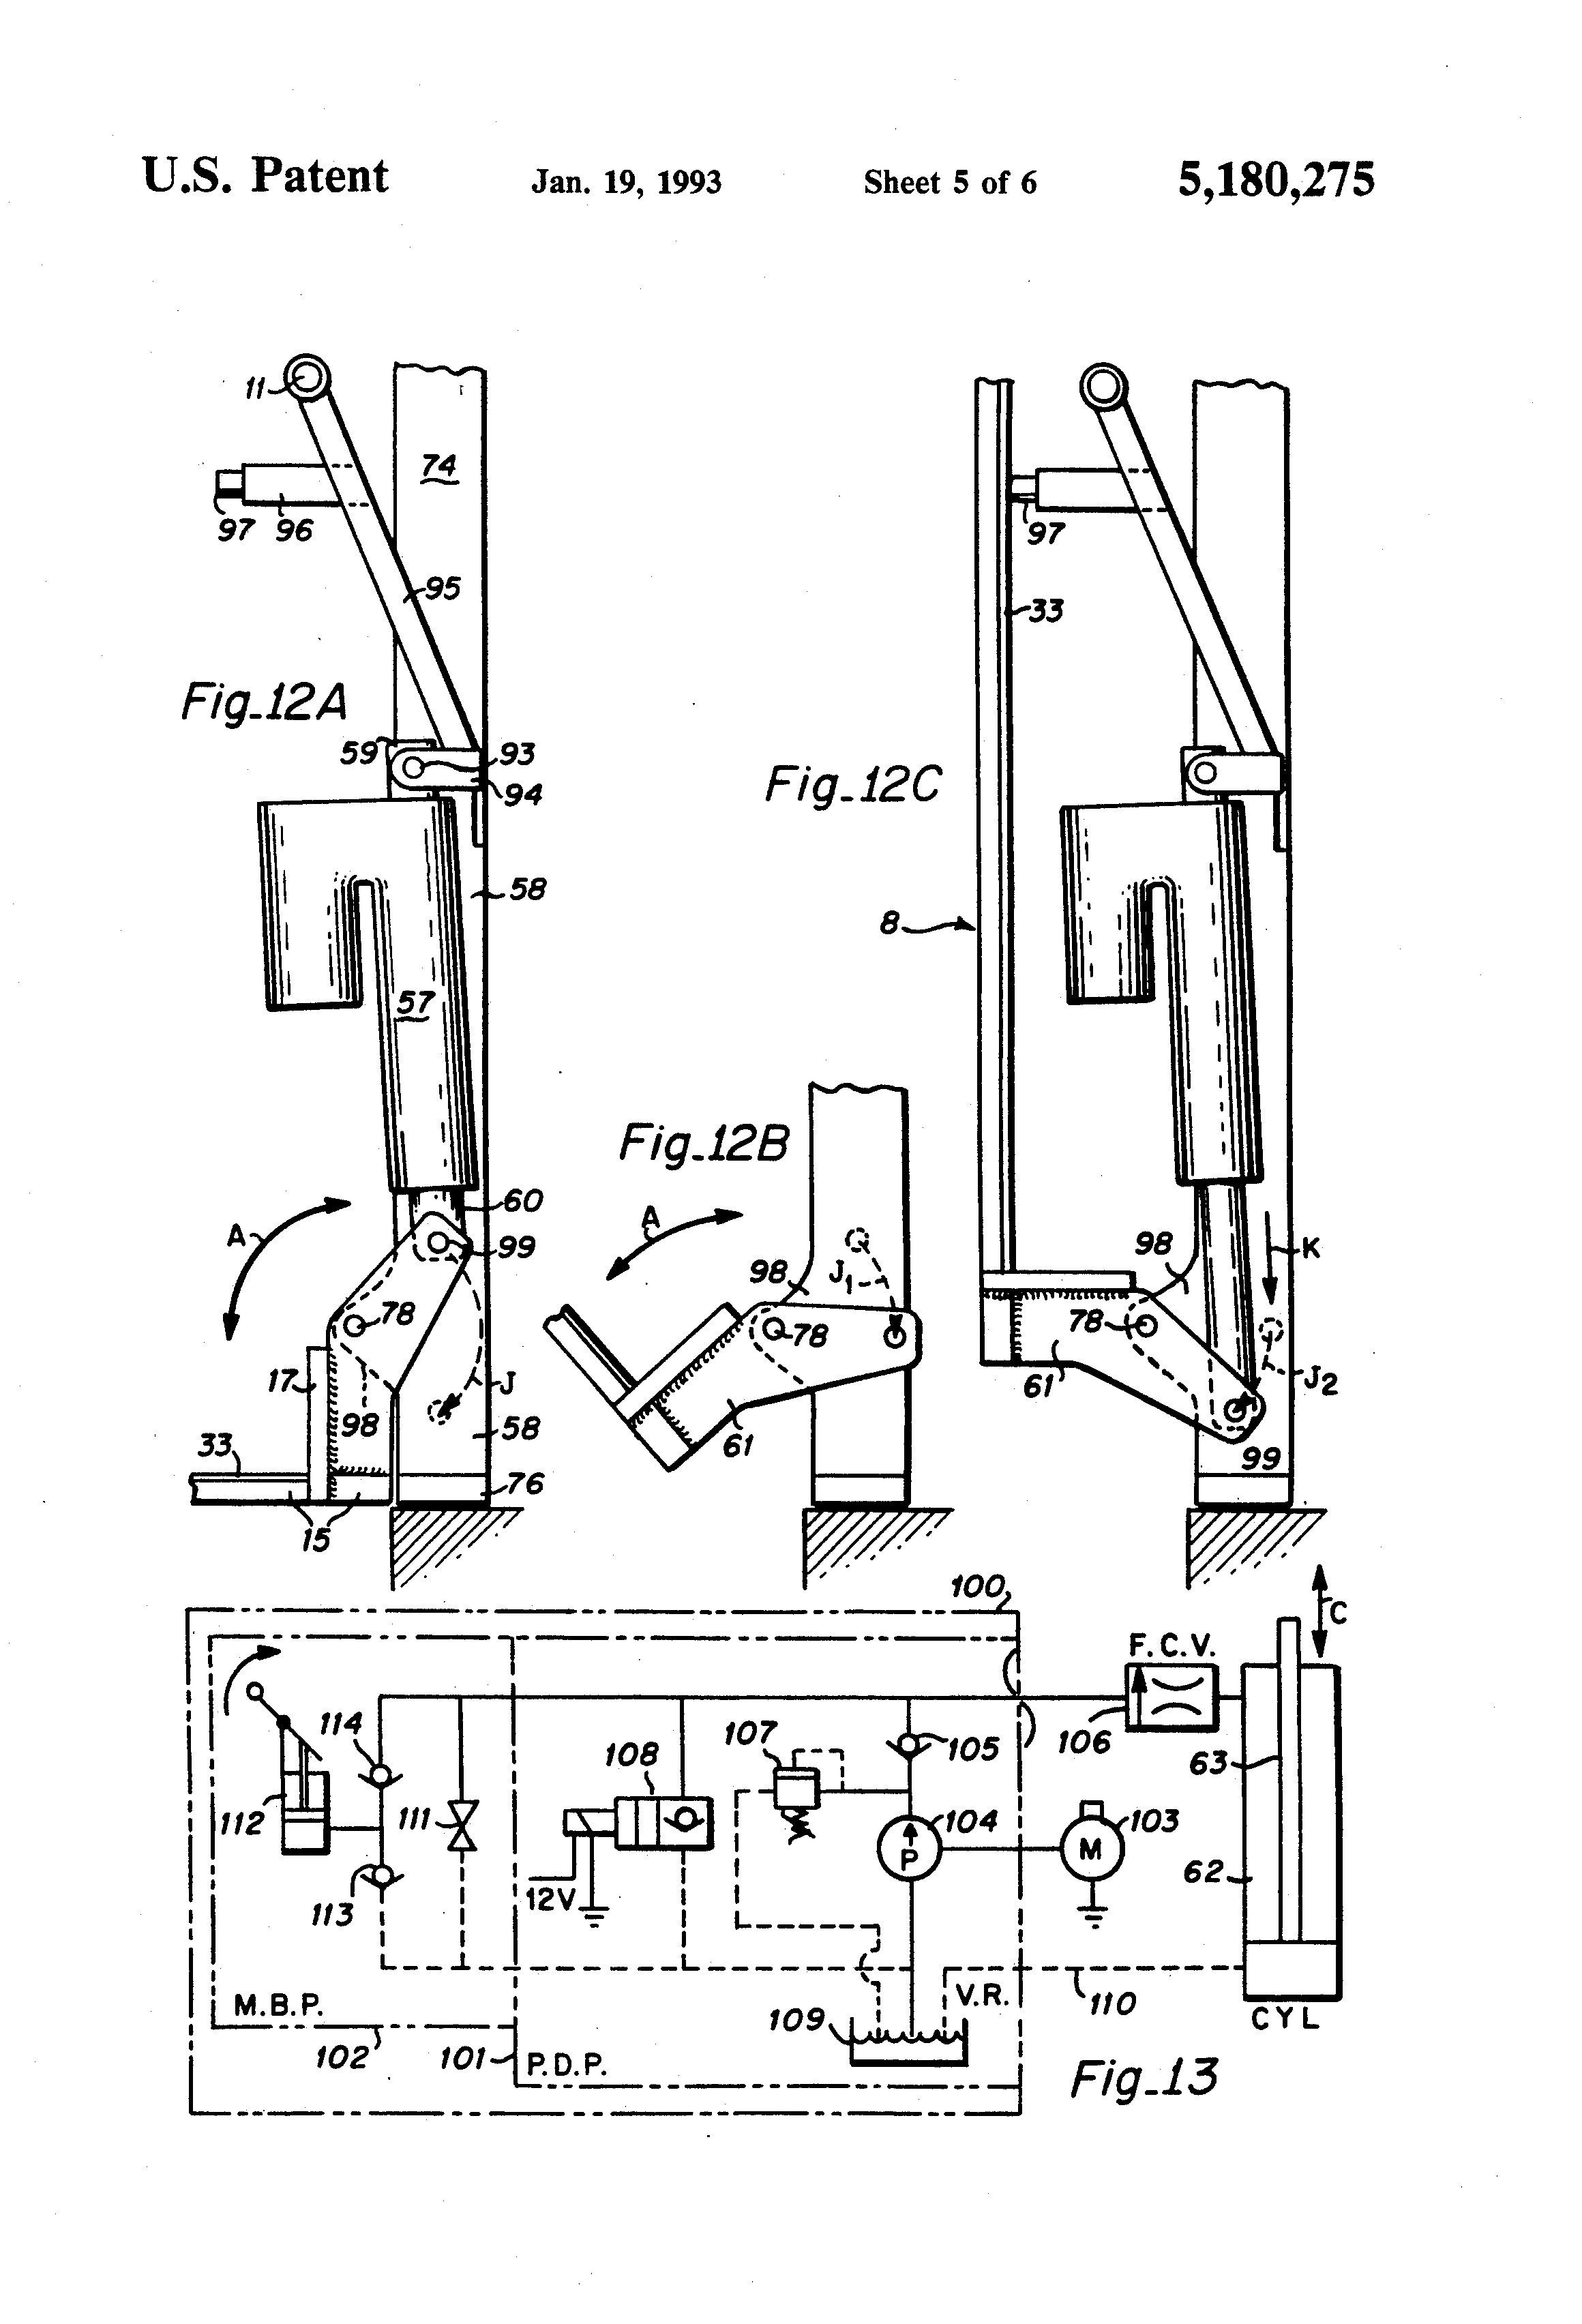 hight resolution of elegant automotive electrical wiring diagram symbols diagrams digramssample diagramimages wiringdiagramsample wiringdiagram